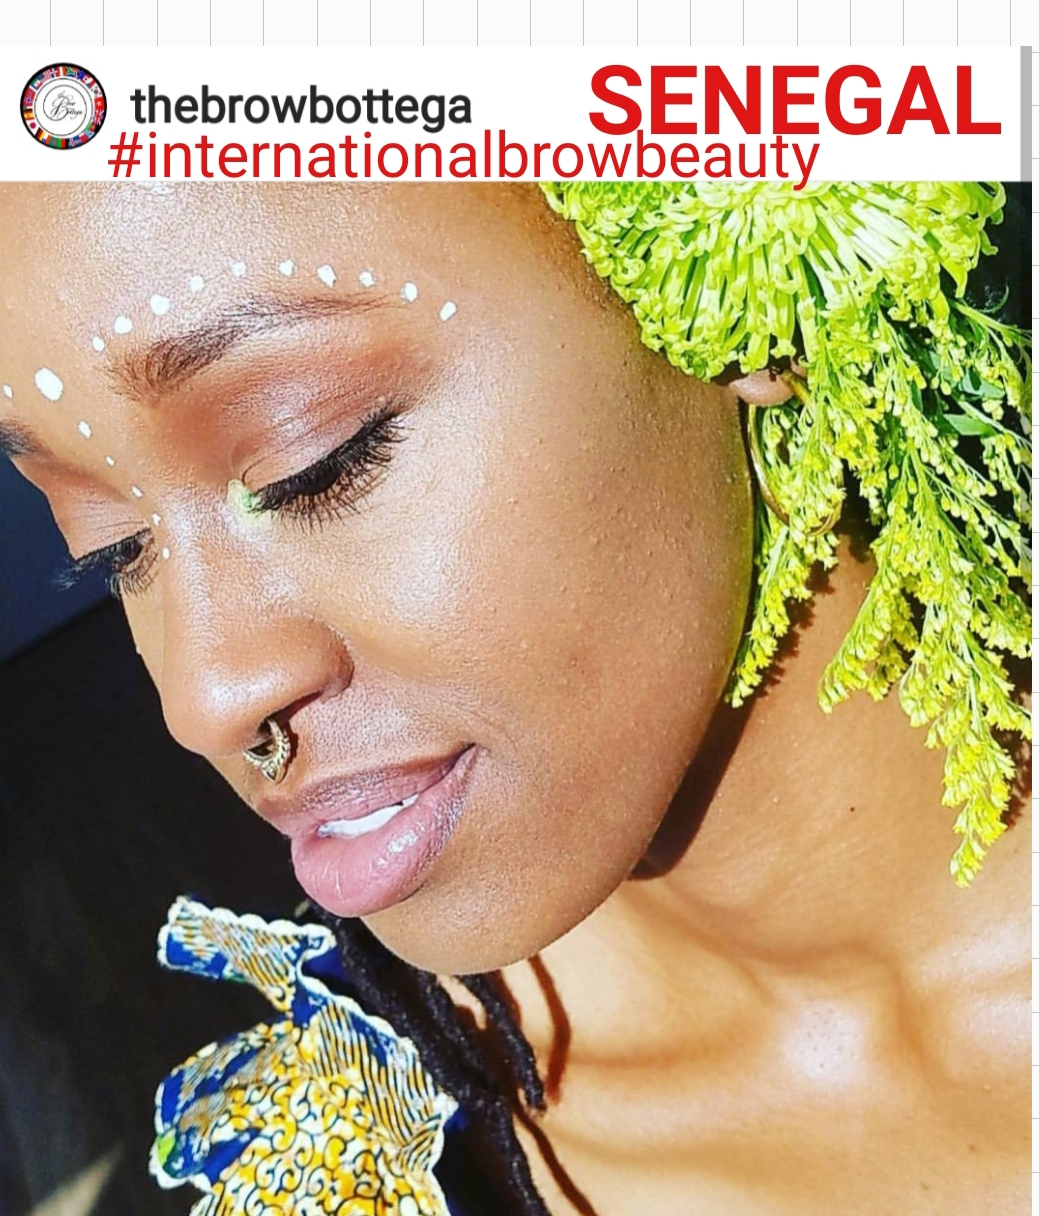 *CLIENT* #internationalbrowbeauty - SENEGAL